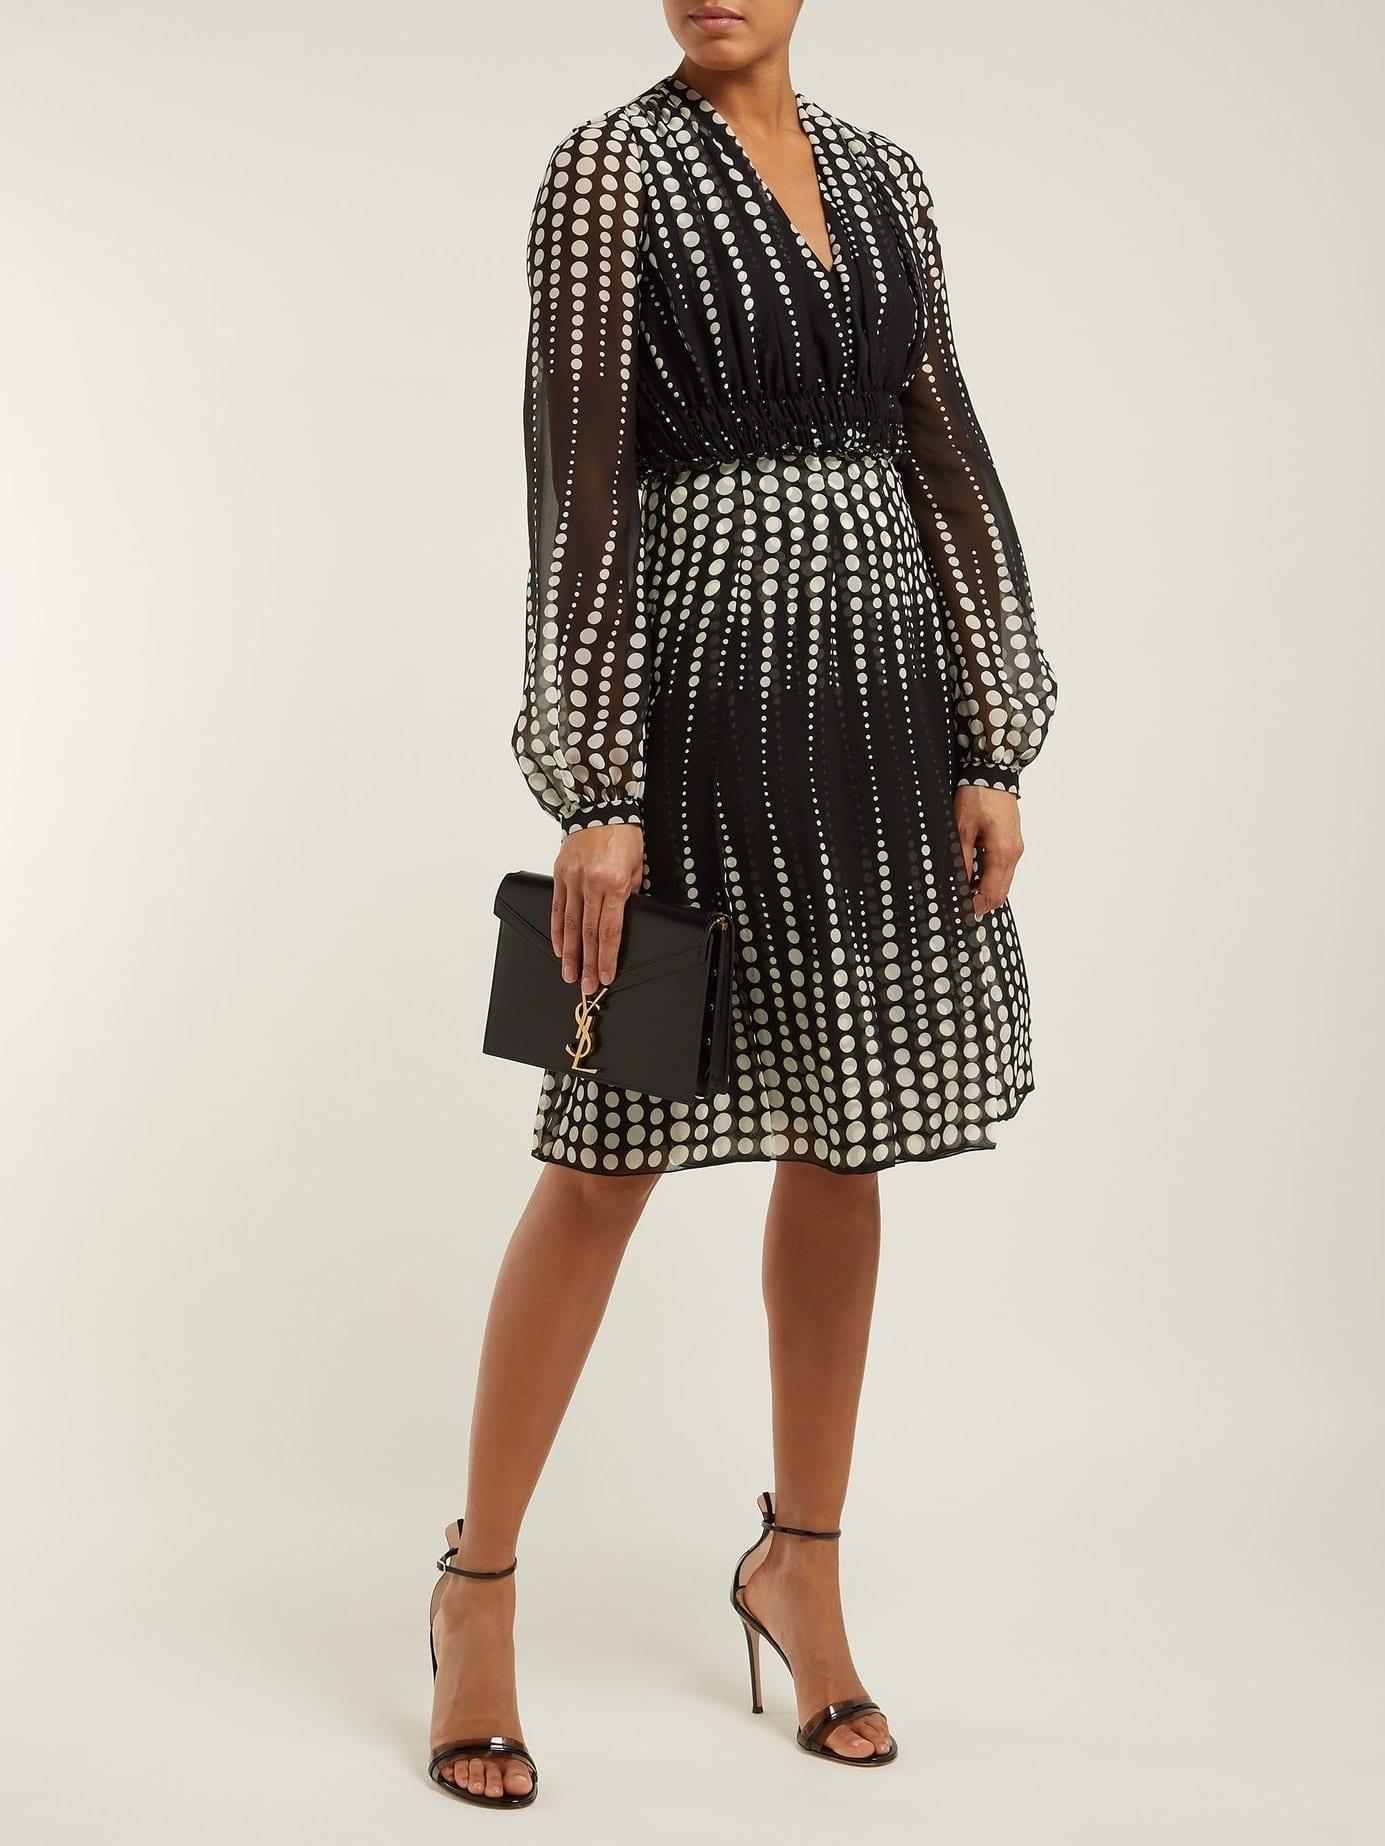 6f4c4958791 GIAMBATTISTA VALLI Polka-Dot Silk-Chiffon Black Dress - We Select ...